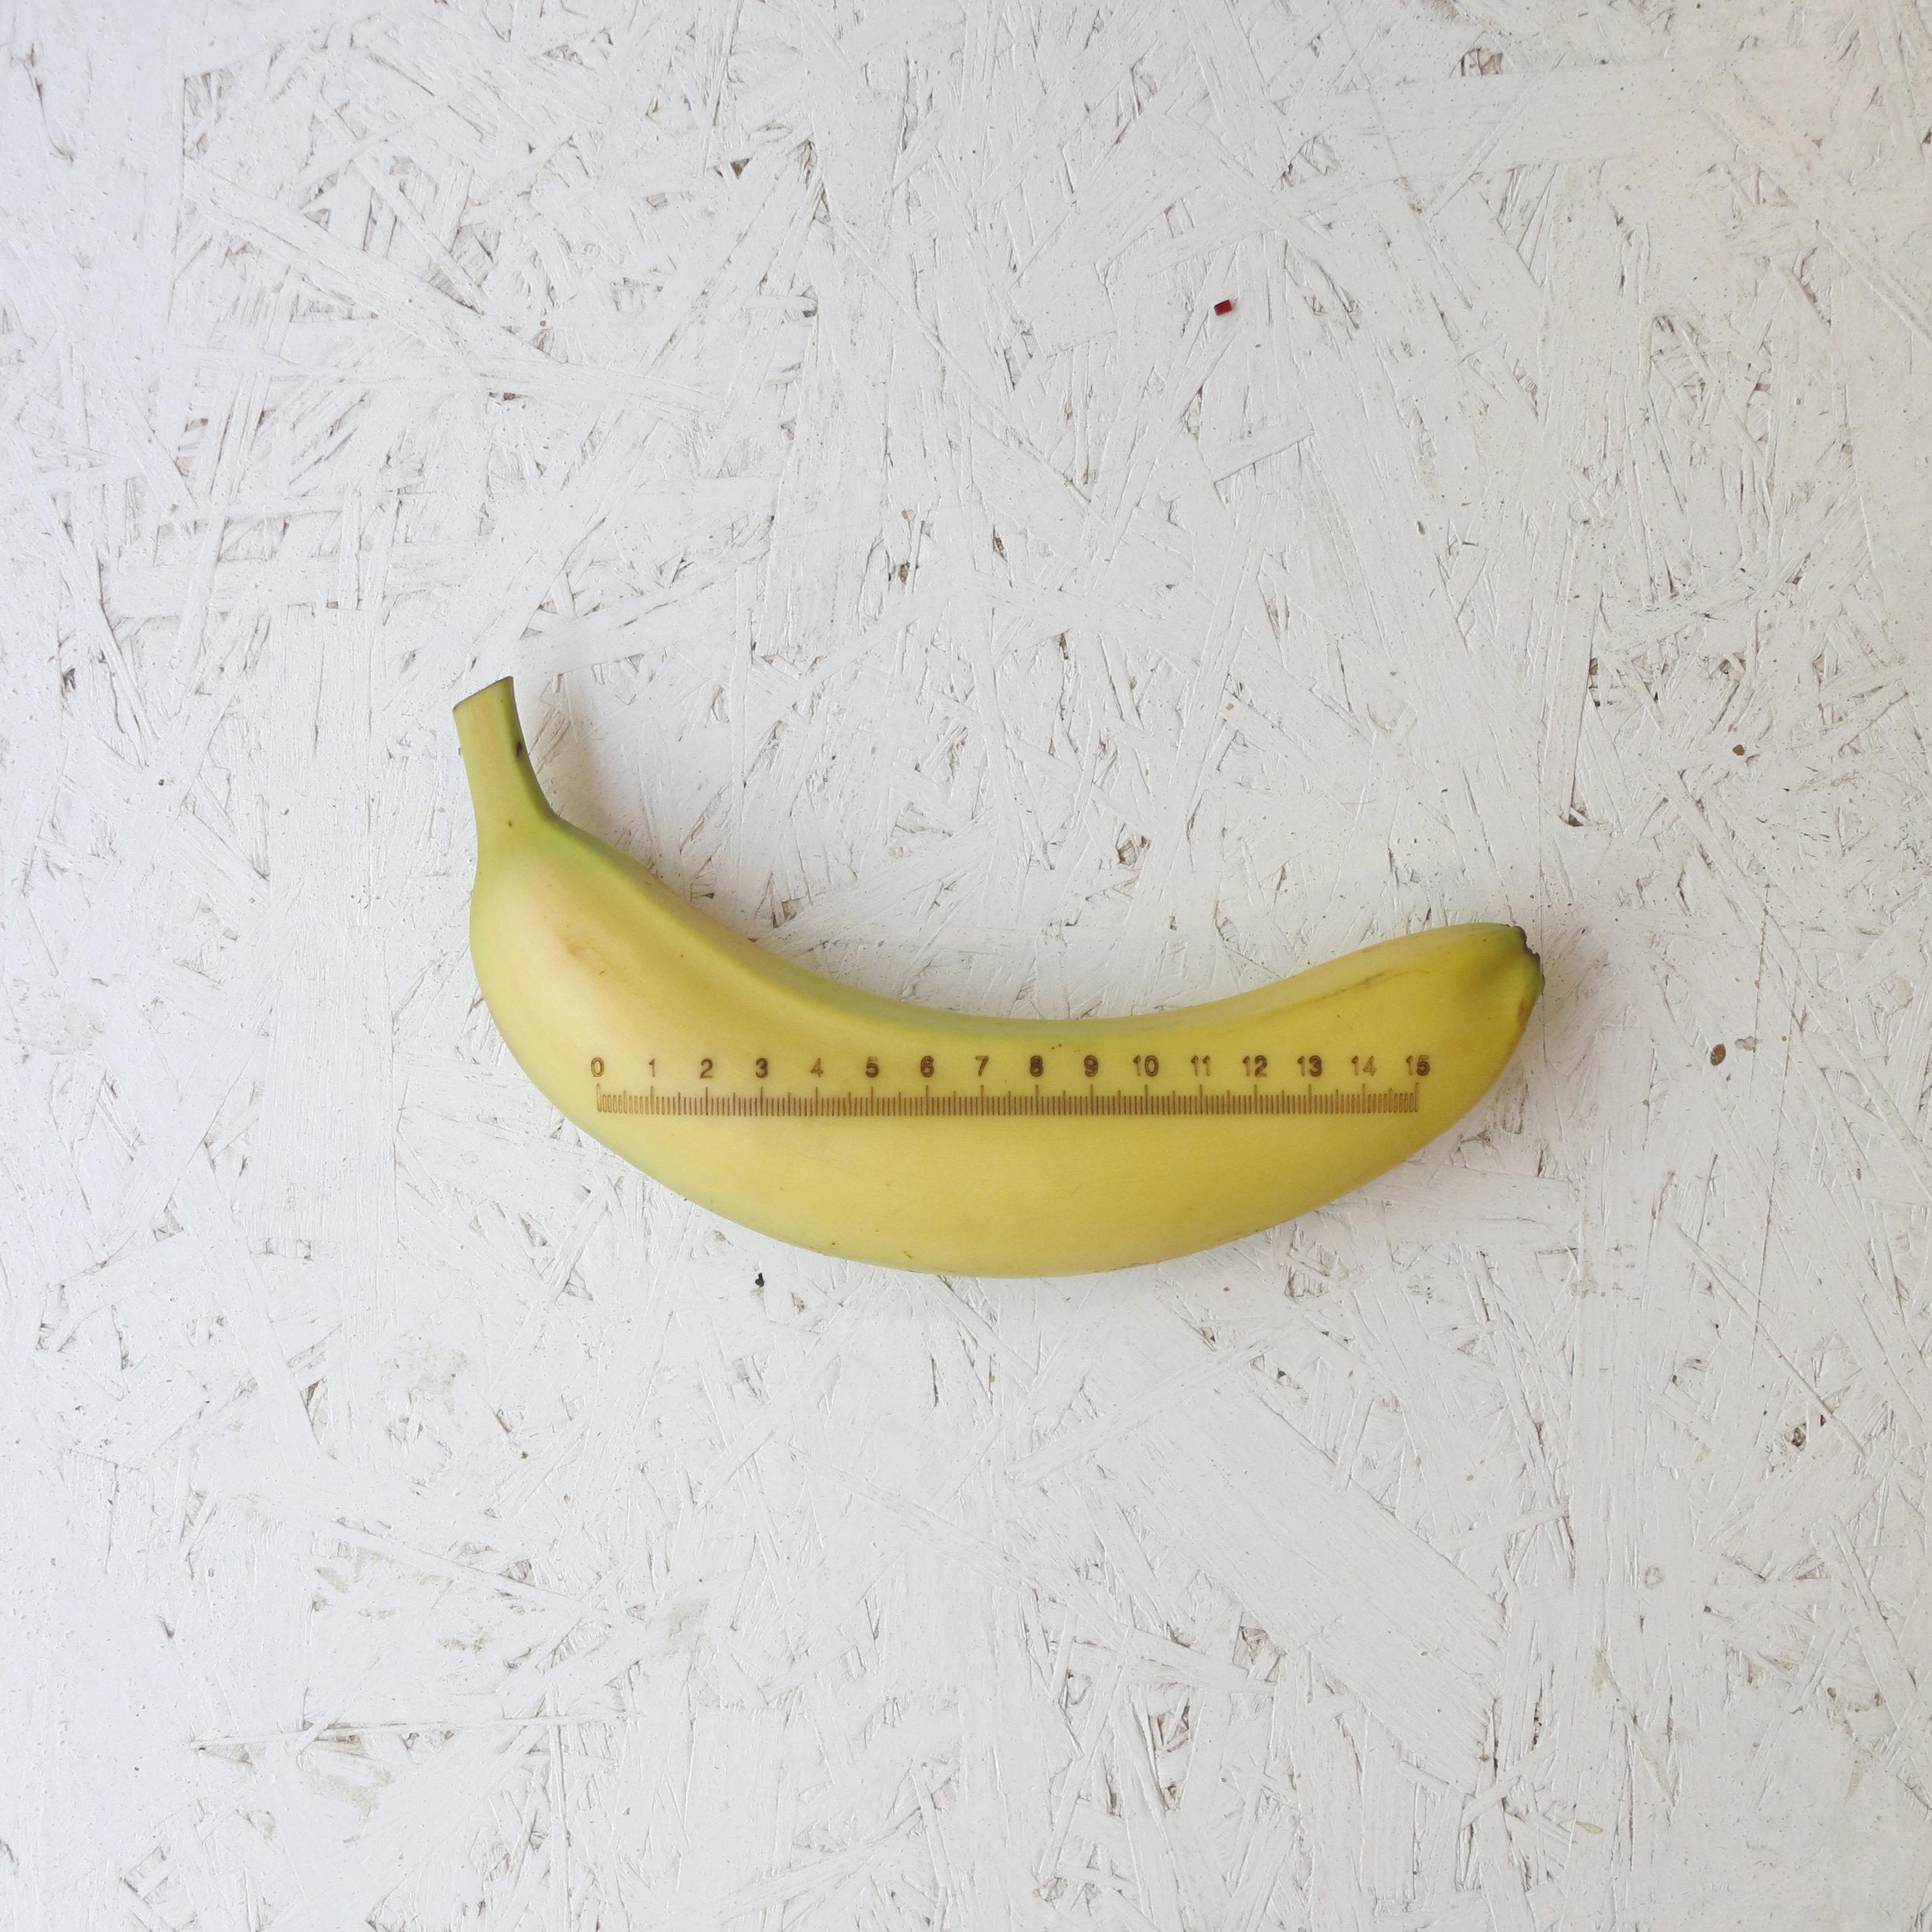 food_banan3.JPG